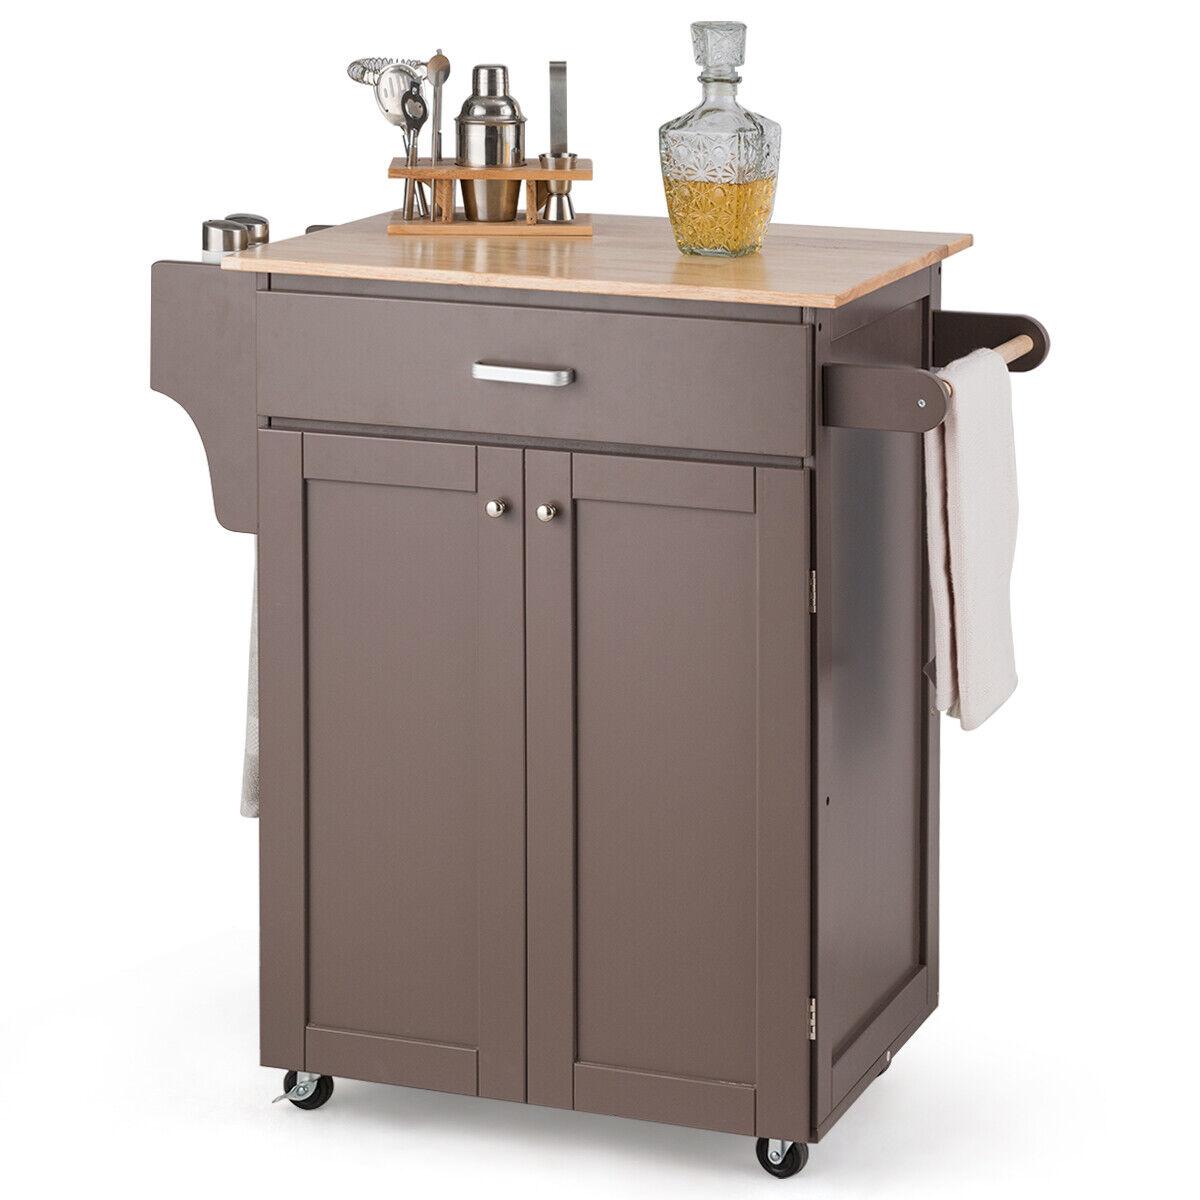 Rolling Kitchen Island Utility Kitchen Cart Home Cabinet W Spice Rack Brown